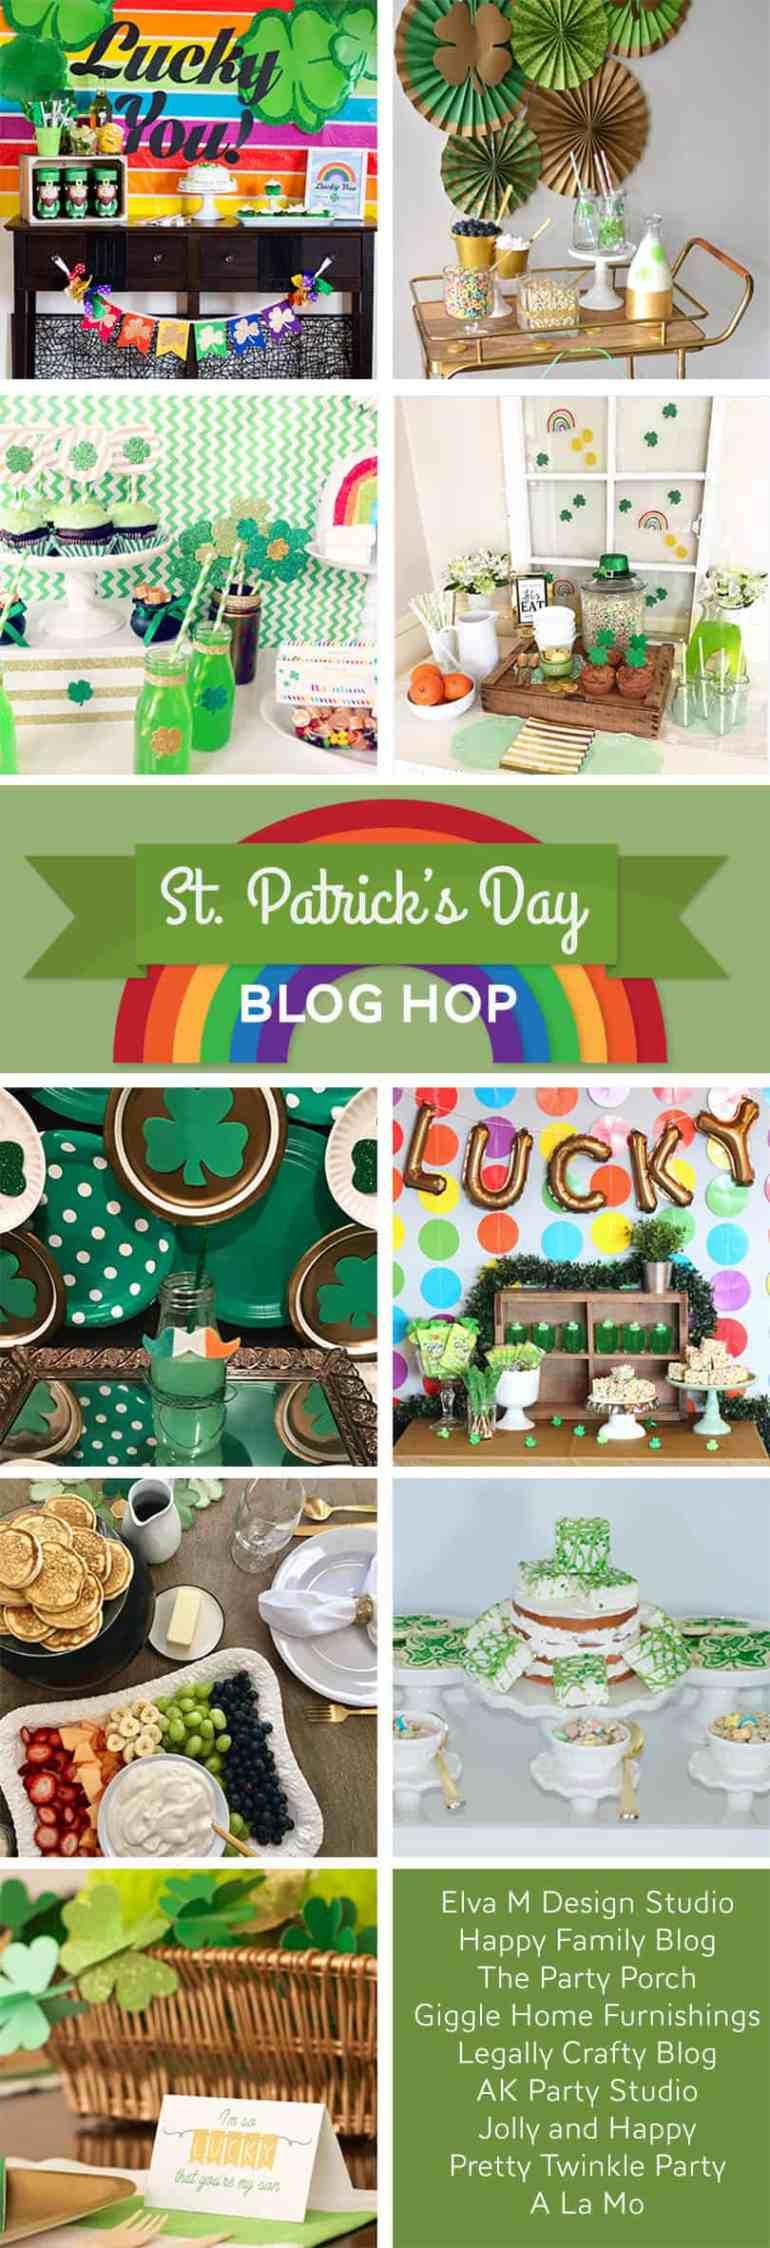 St. Patrick's Day Blog Hop Bloggers